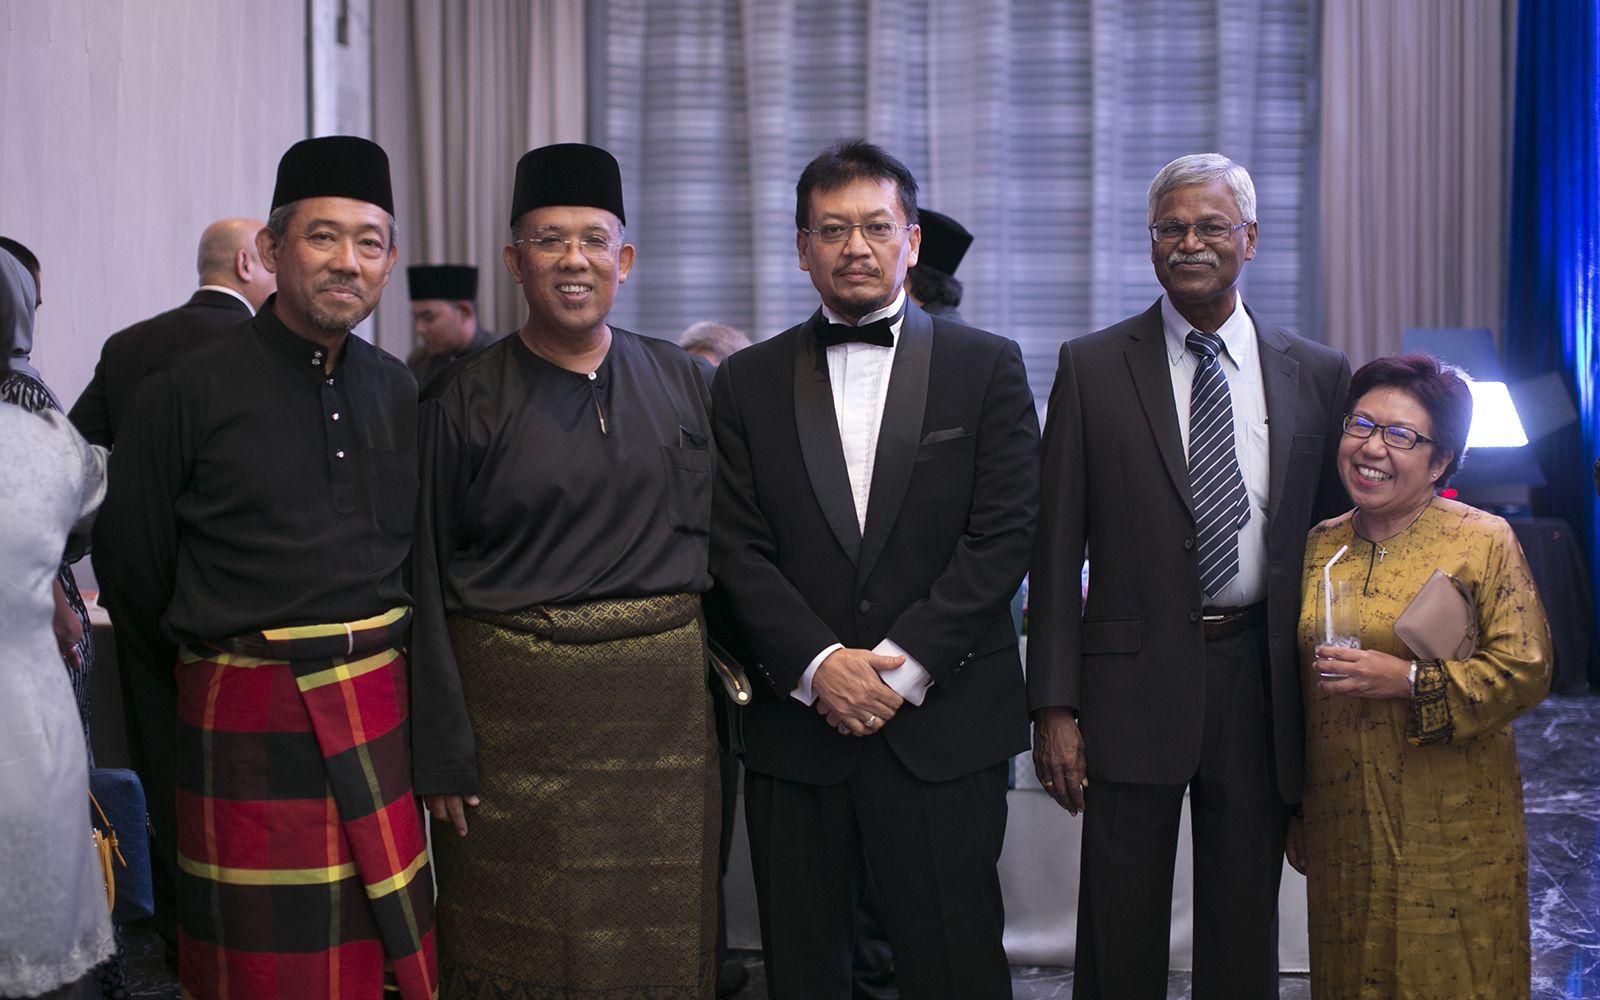 Ir. Mohd Niza, Datuk Baderul Sham, Fazil Ibrahim, K.Kanisan and Elizabeth Rozario